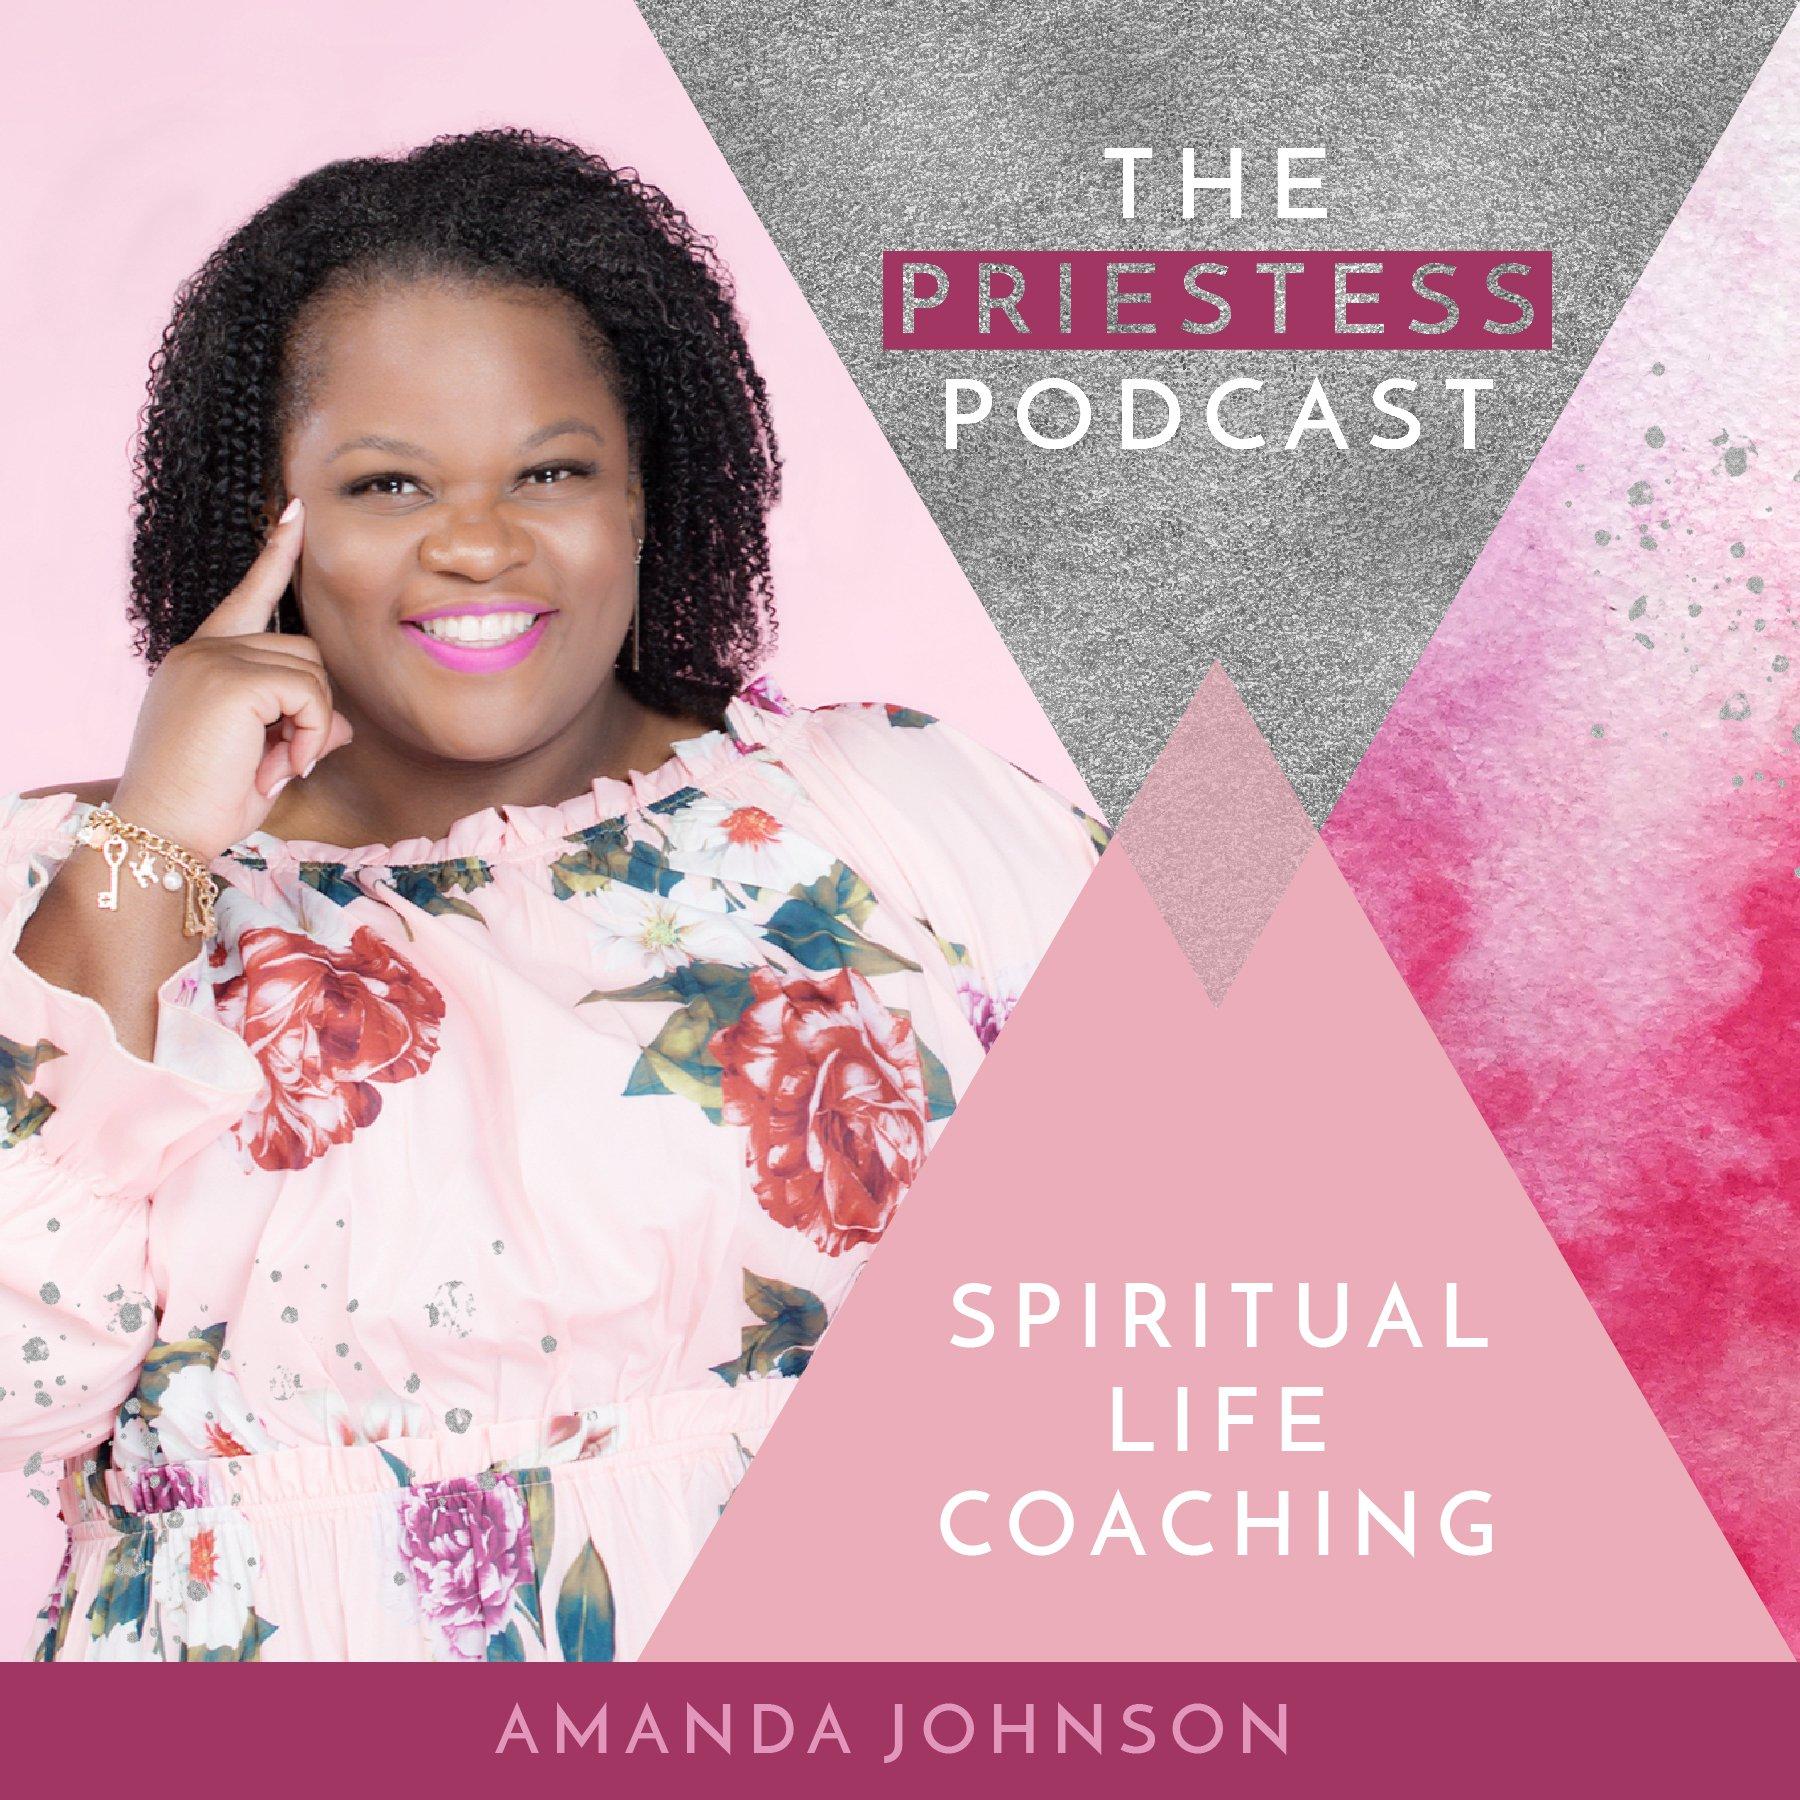 Amanda Johnson on Spiritual Life Coaching